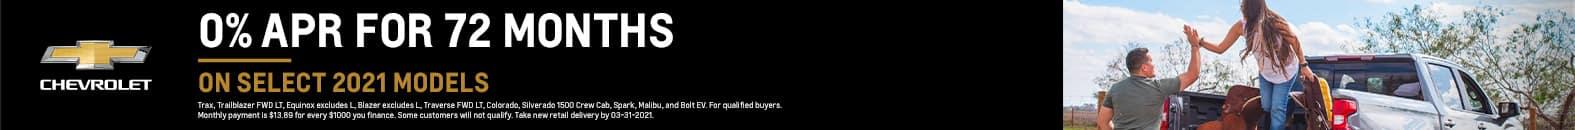 0% APR For 72 Months On Select 2021 Models - Fiesta Chevrolet in Edinburg, Texas